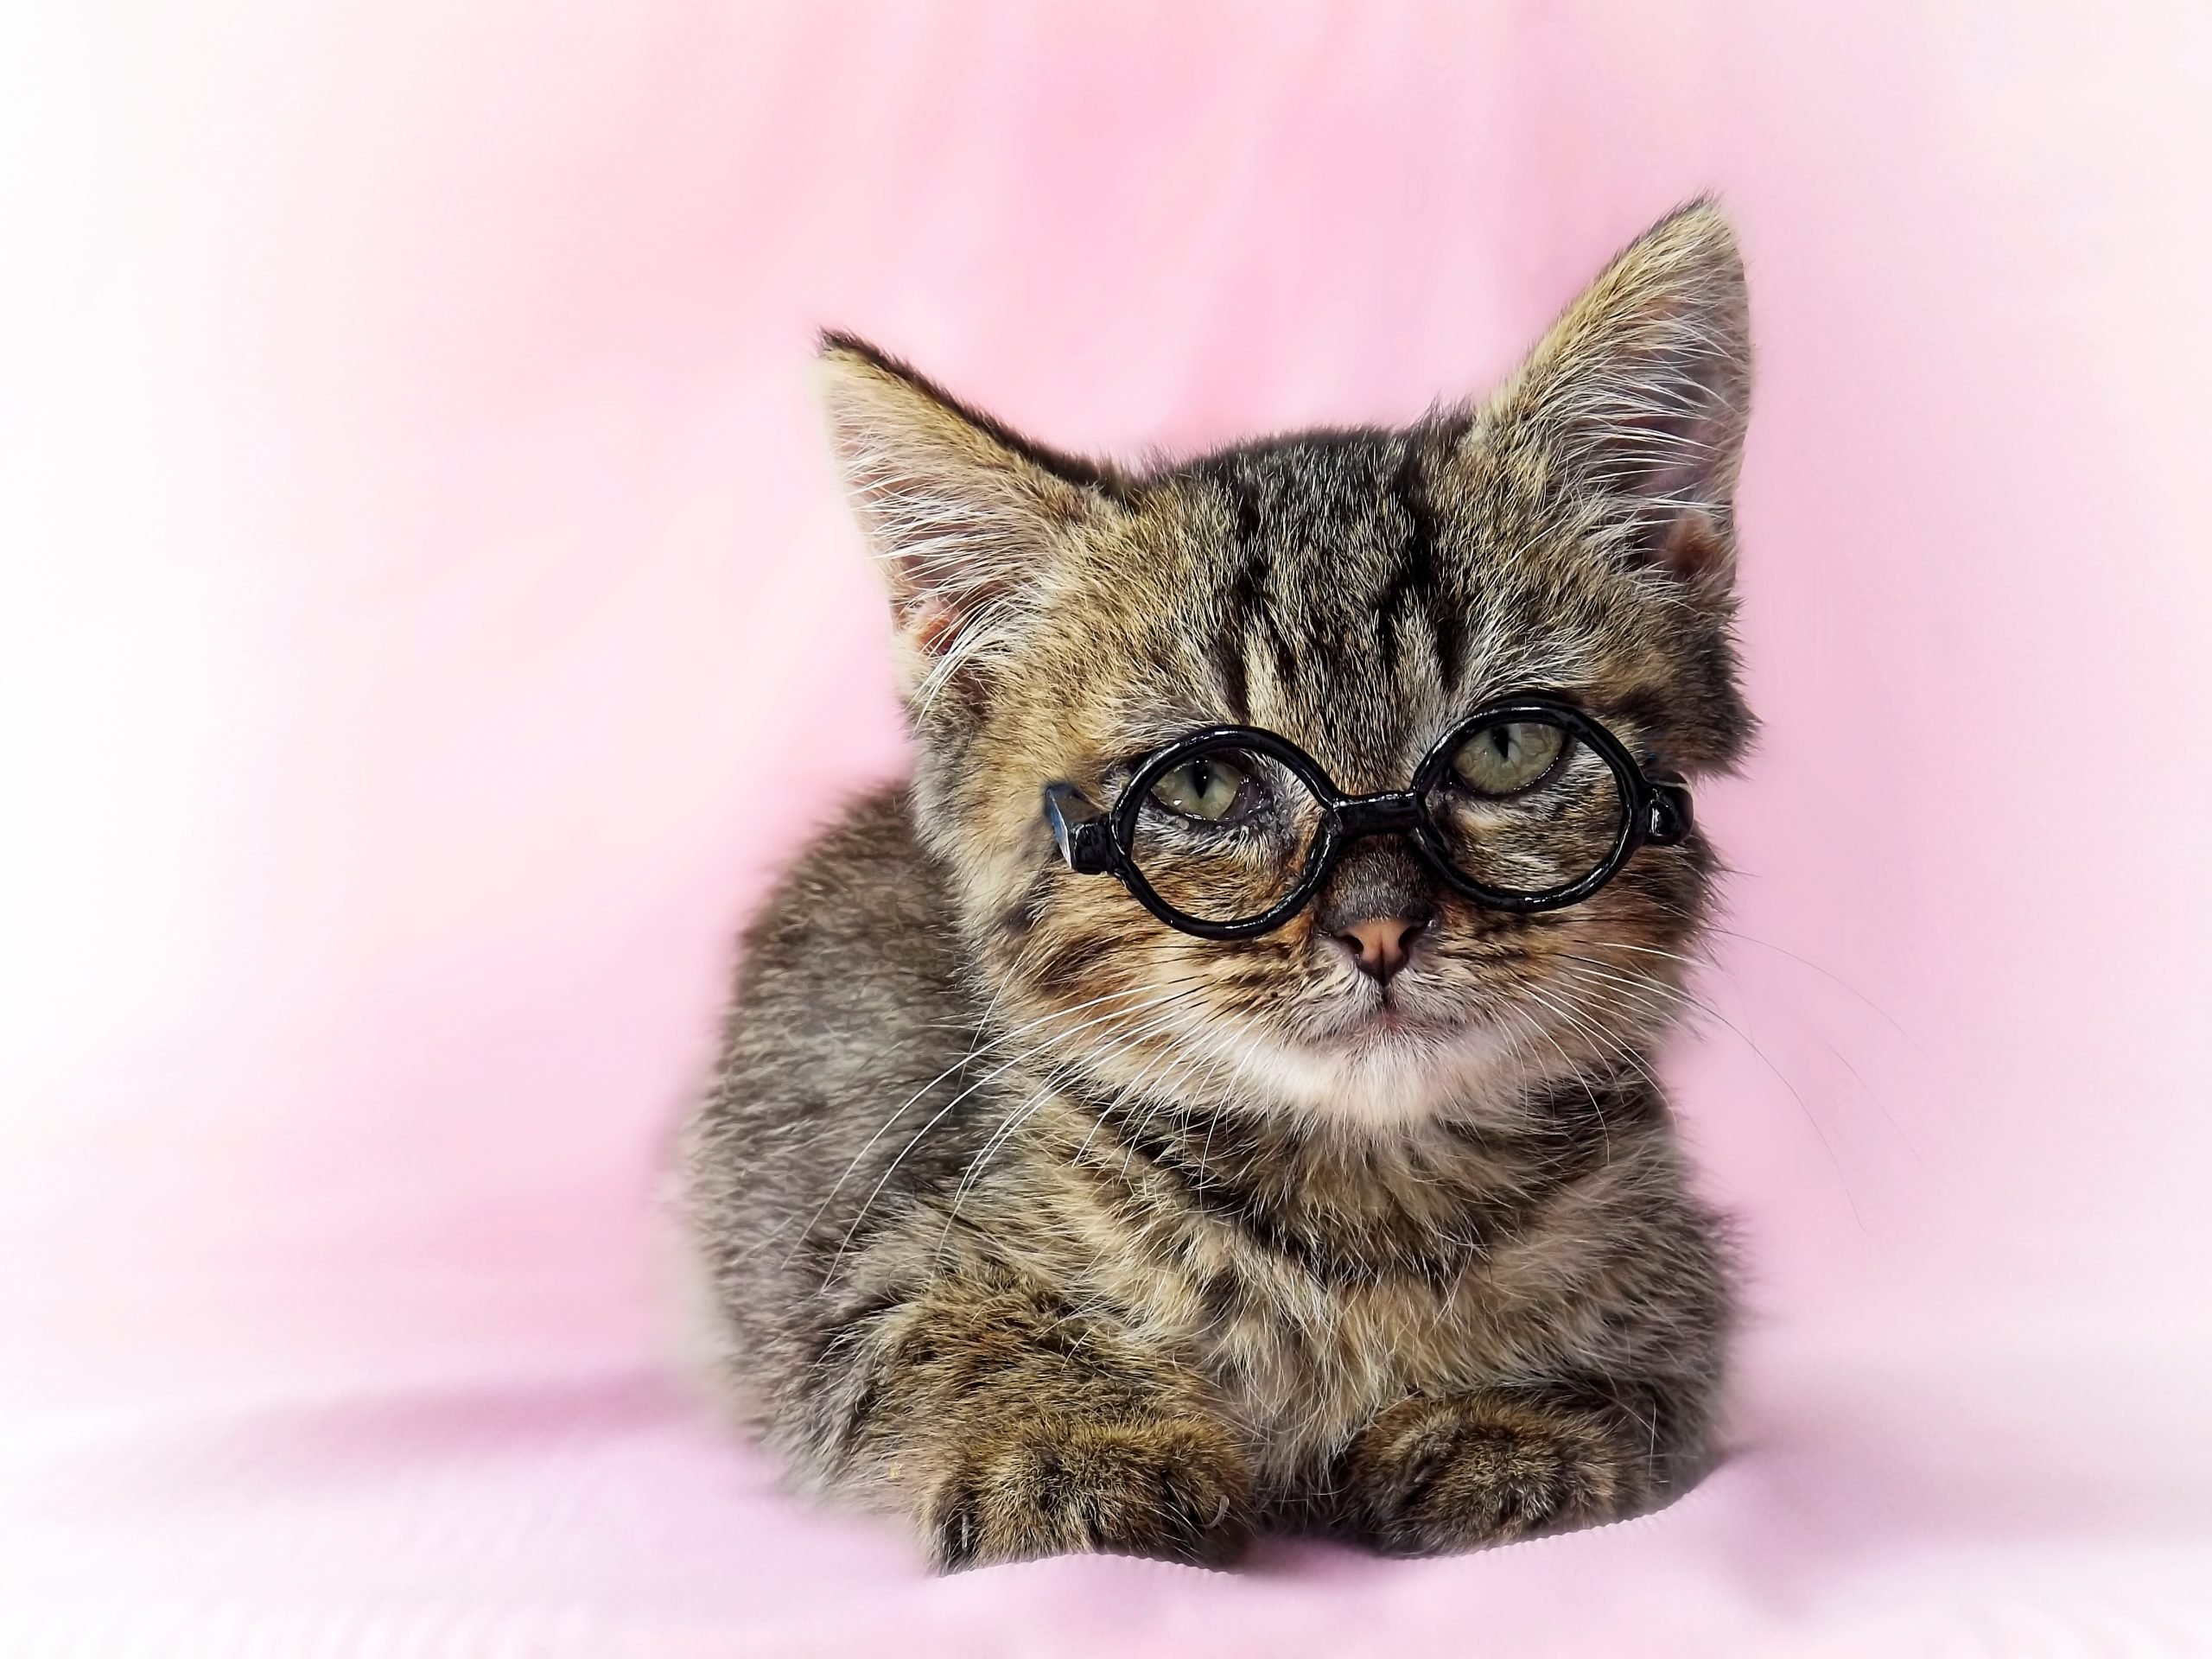 Portrait Of Kitten Wearing Eyeglasses While Sitting On Bed